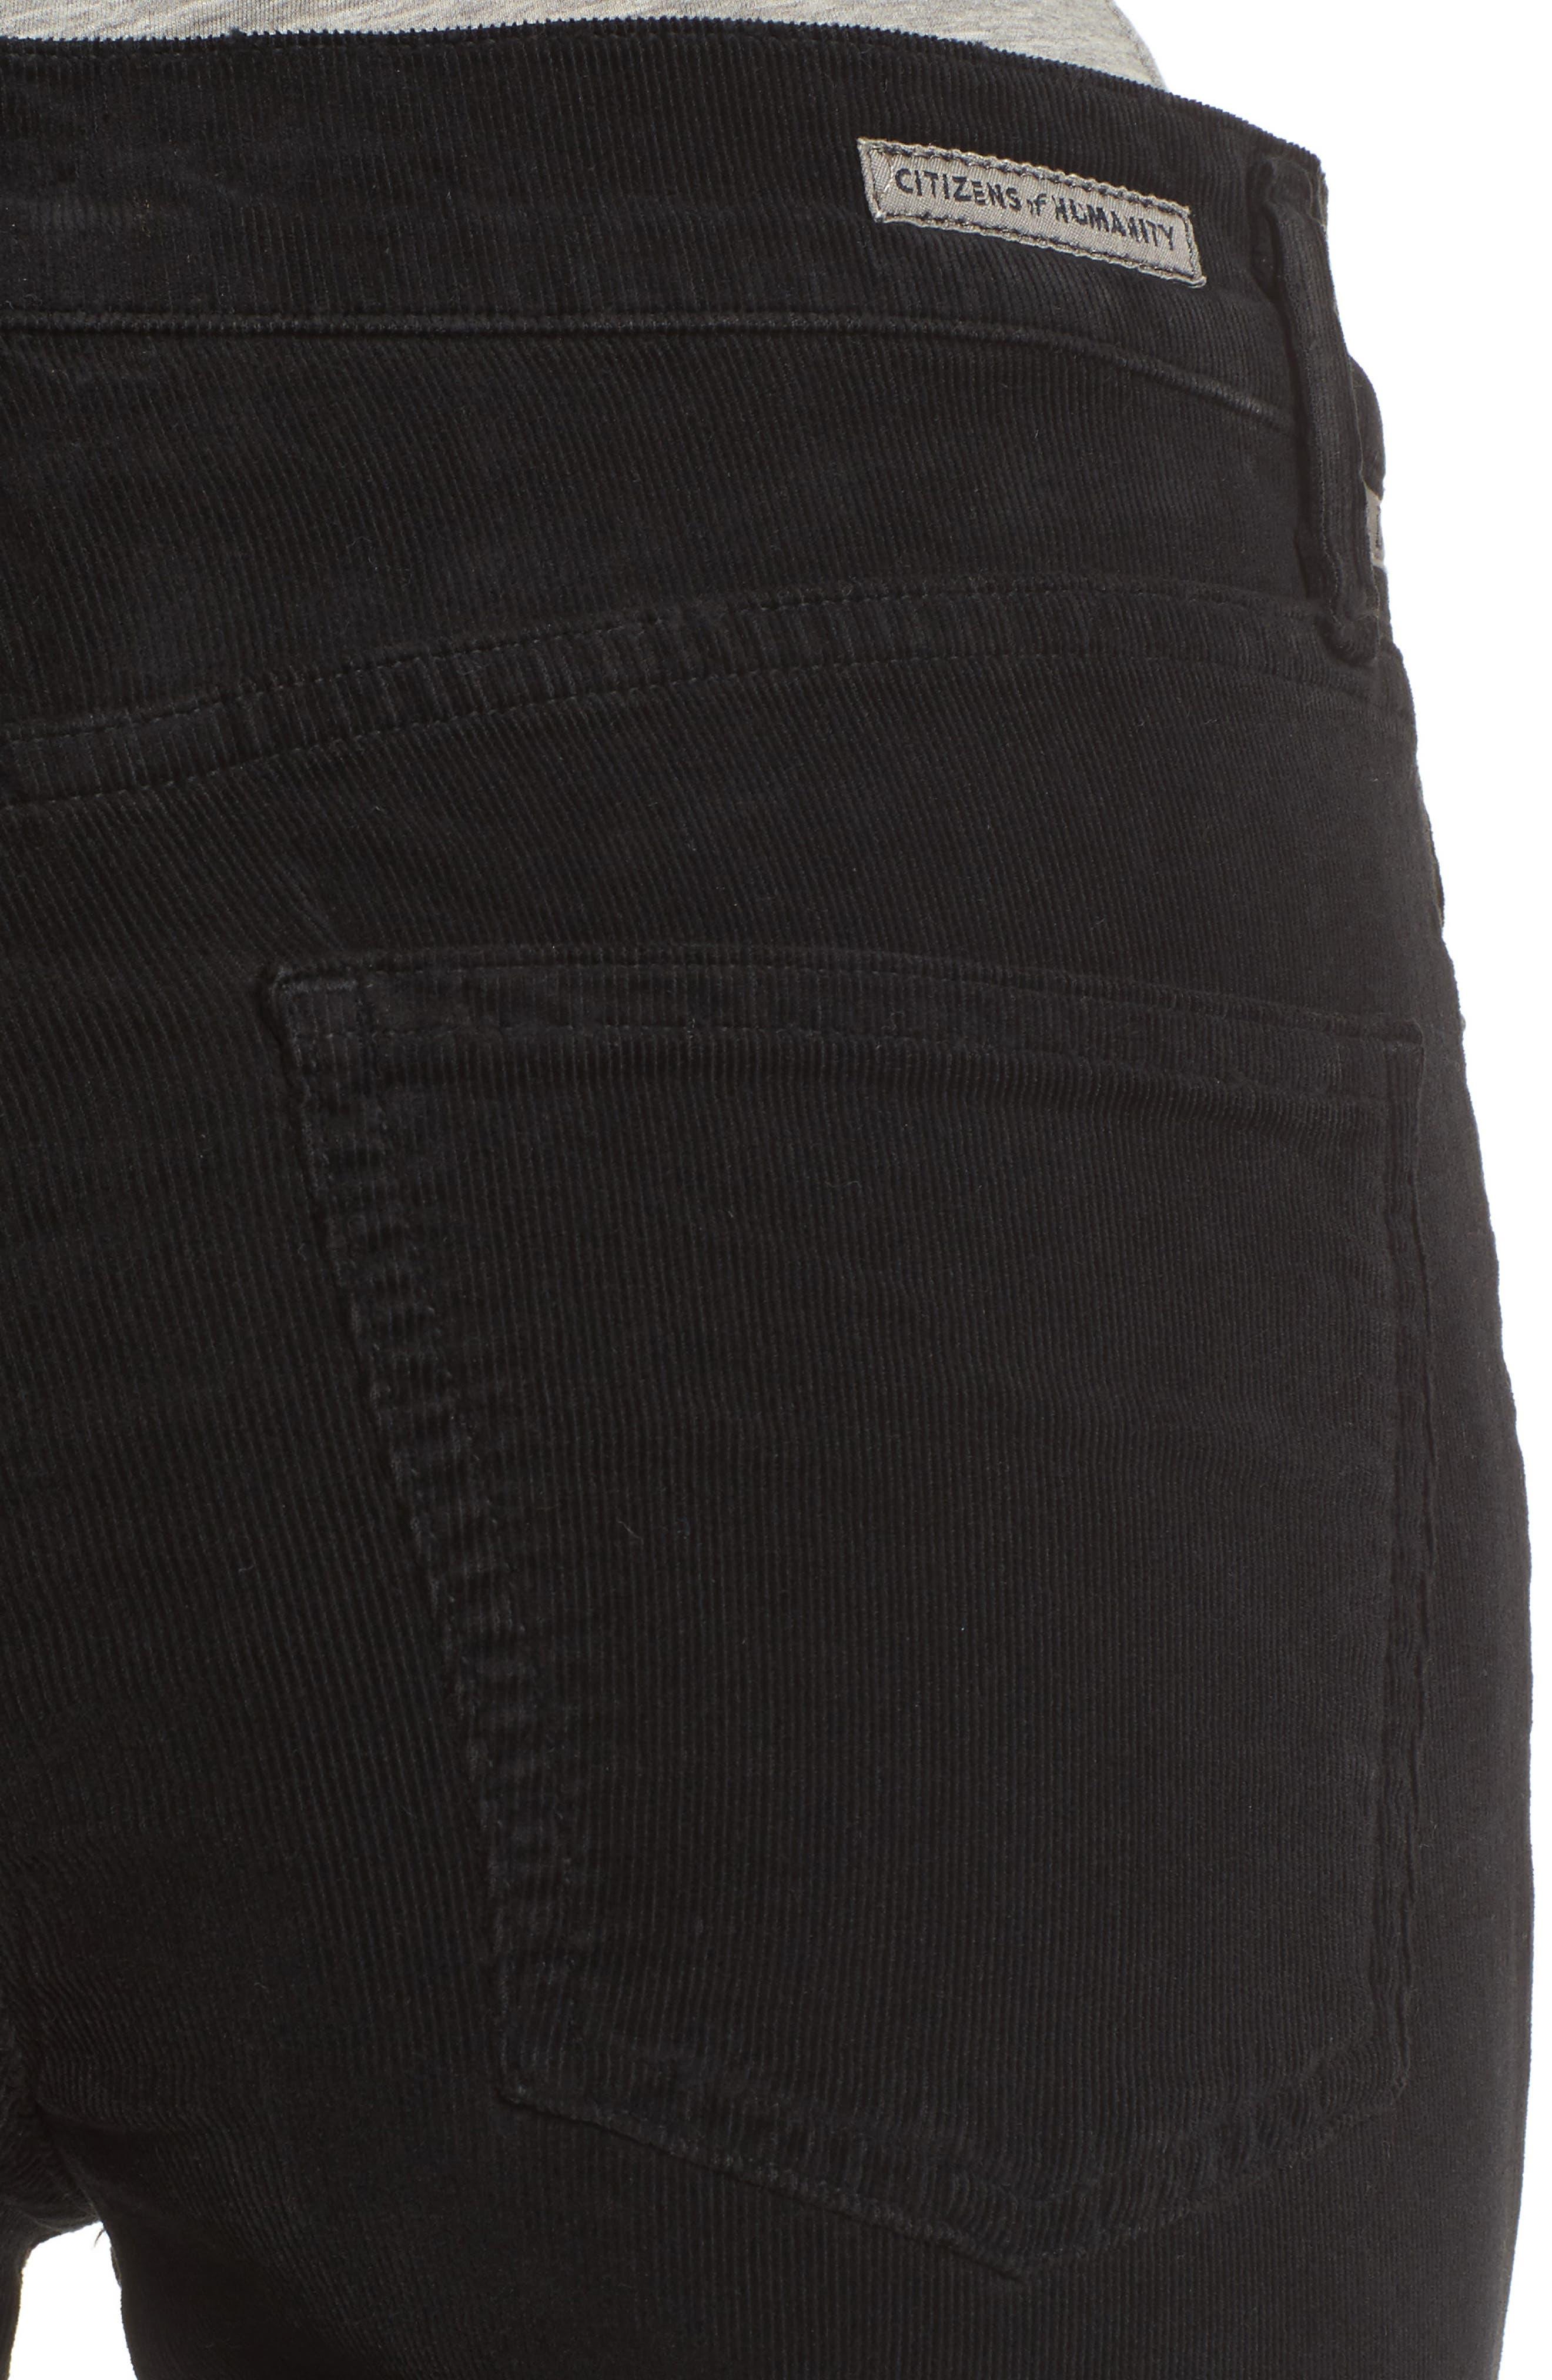 Rocket High Waist Skinny Corduroy Pants,                             Alternate thumbnail 4, color,                             006